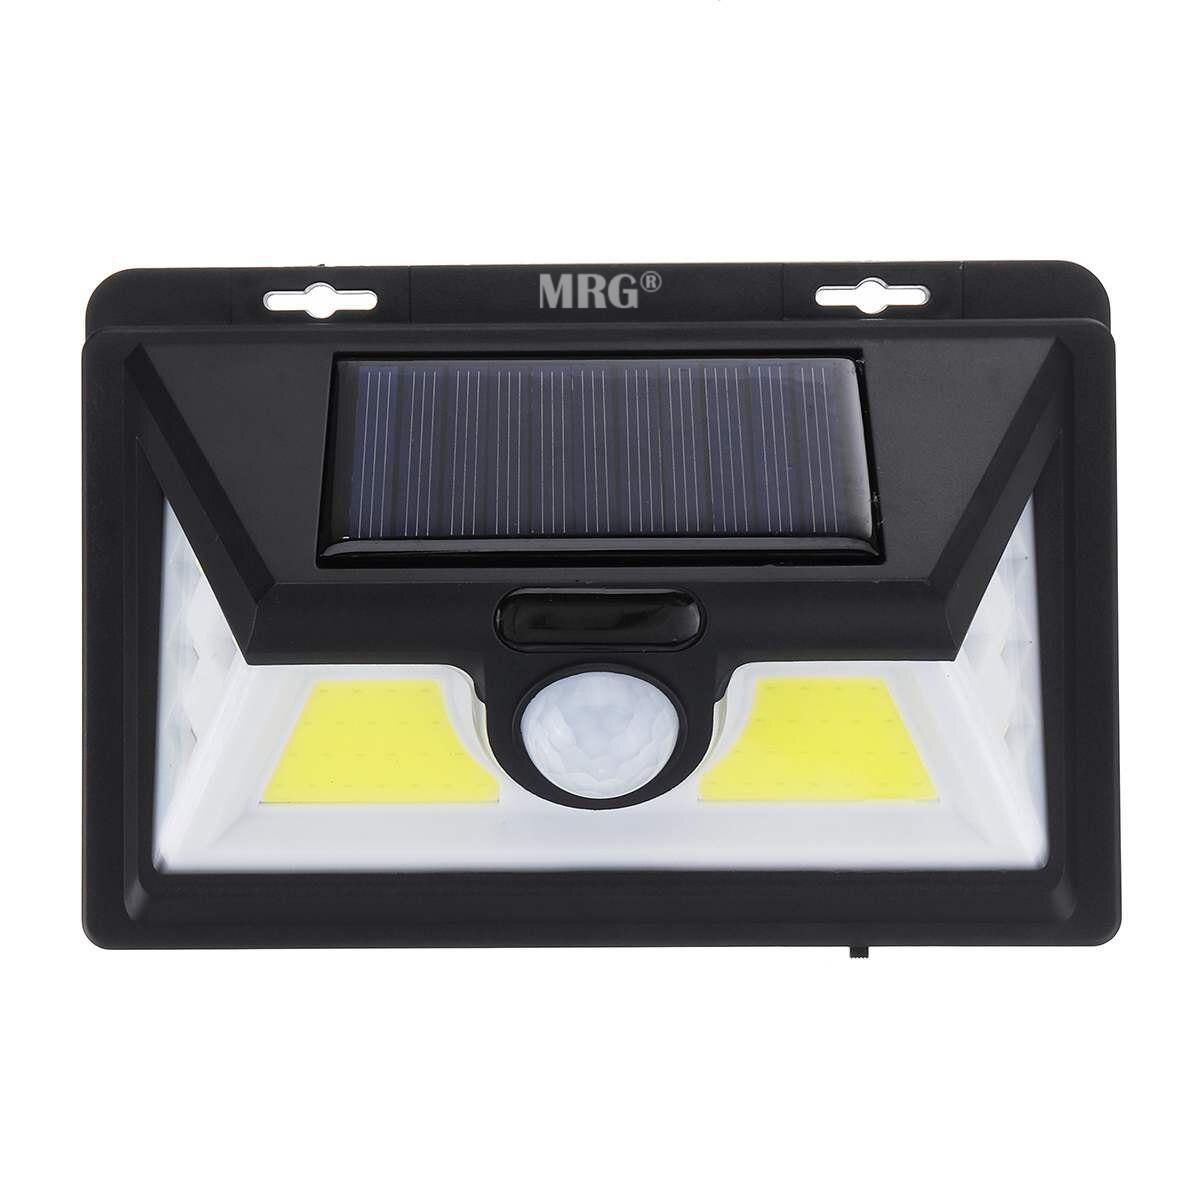 Panou Led Solar MRG A-1828B, Incarcare solara, COB + SMD, Senzor miscare